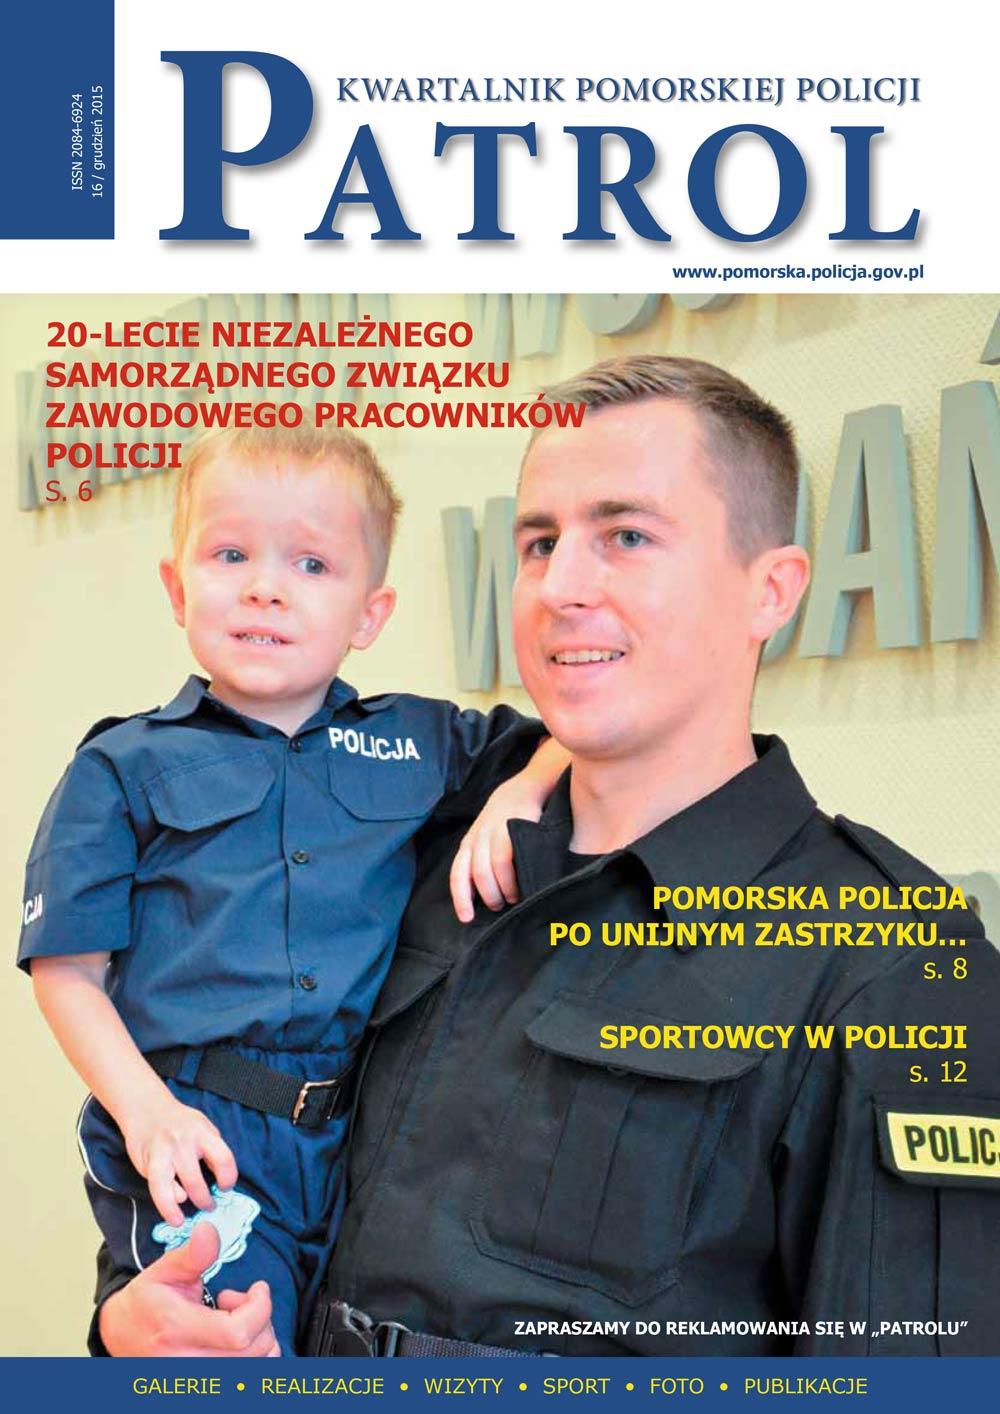 [2015, 04] PATROL. KWARTALNIK POMORSKIEJ POLICJI. - 2014, [nr] 16 / grudzień, www.pomorska.policja.gov.pl